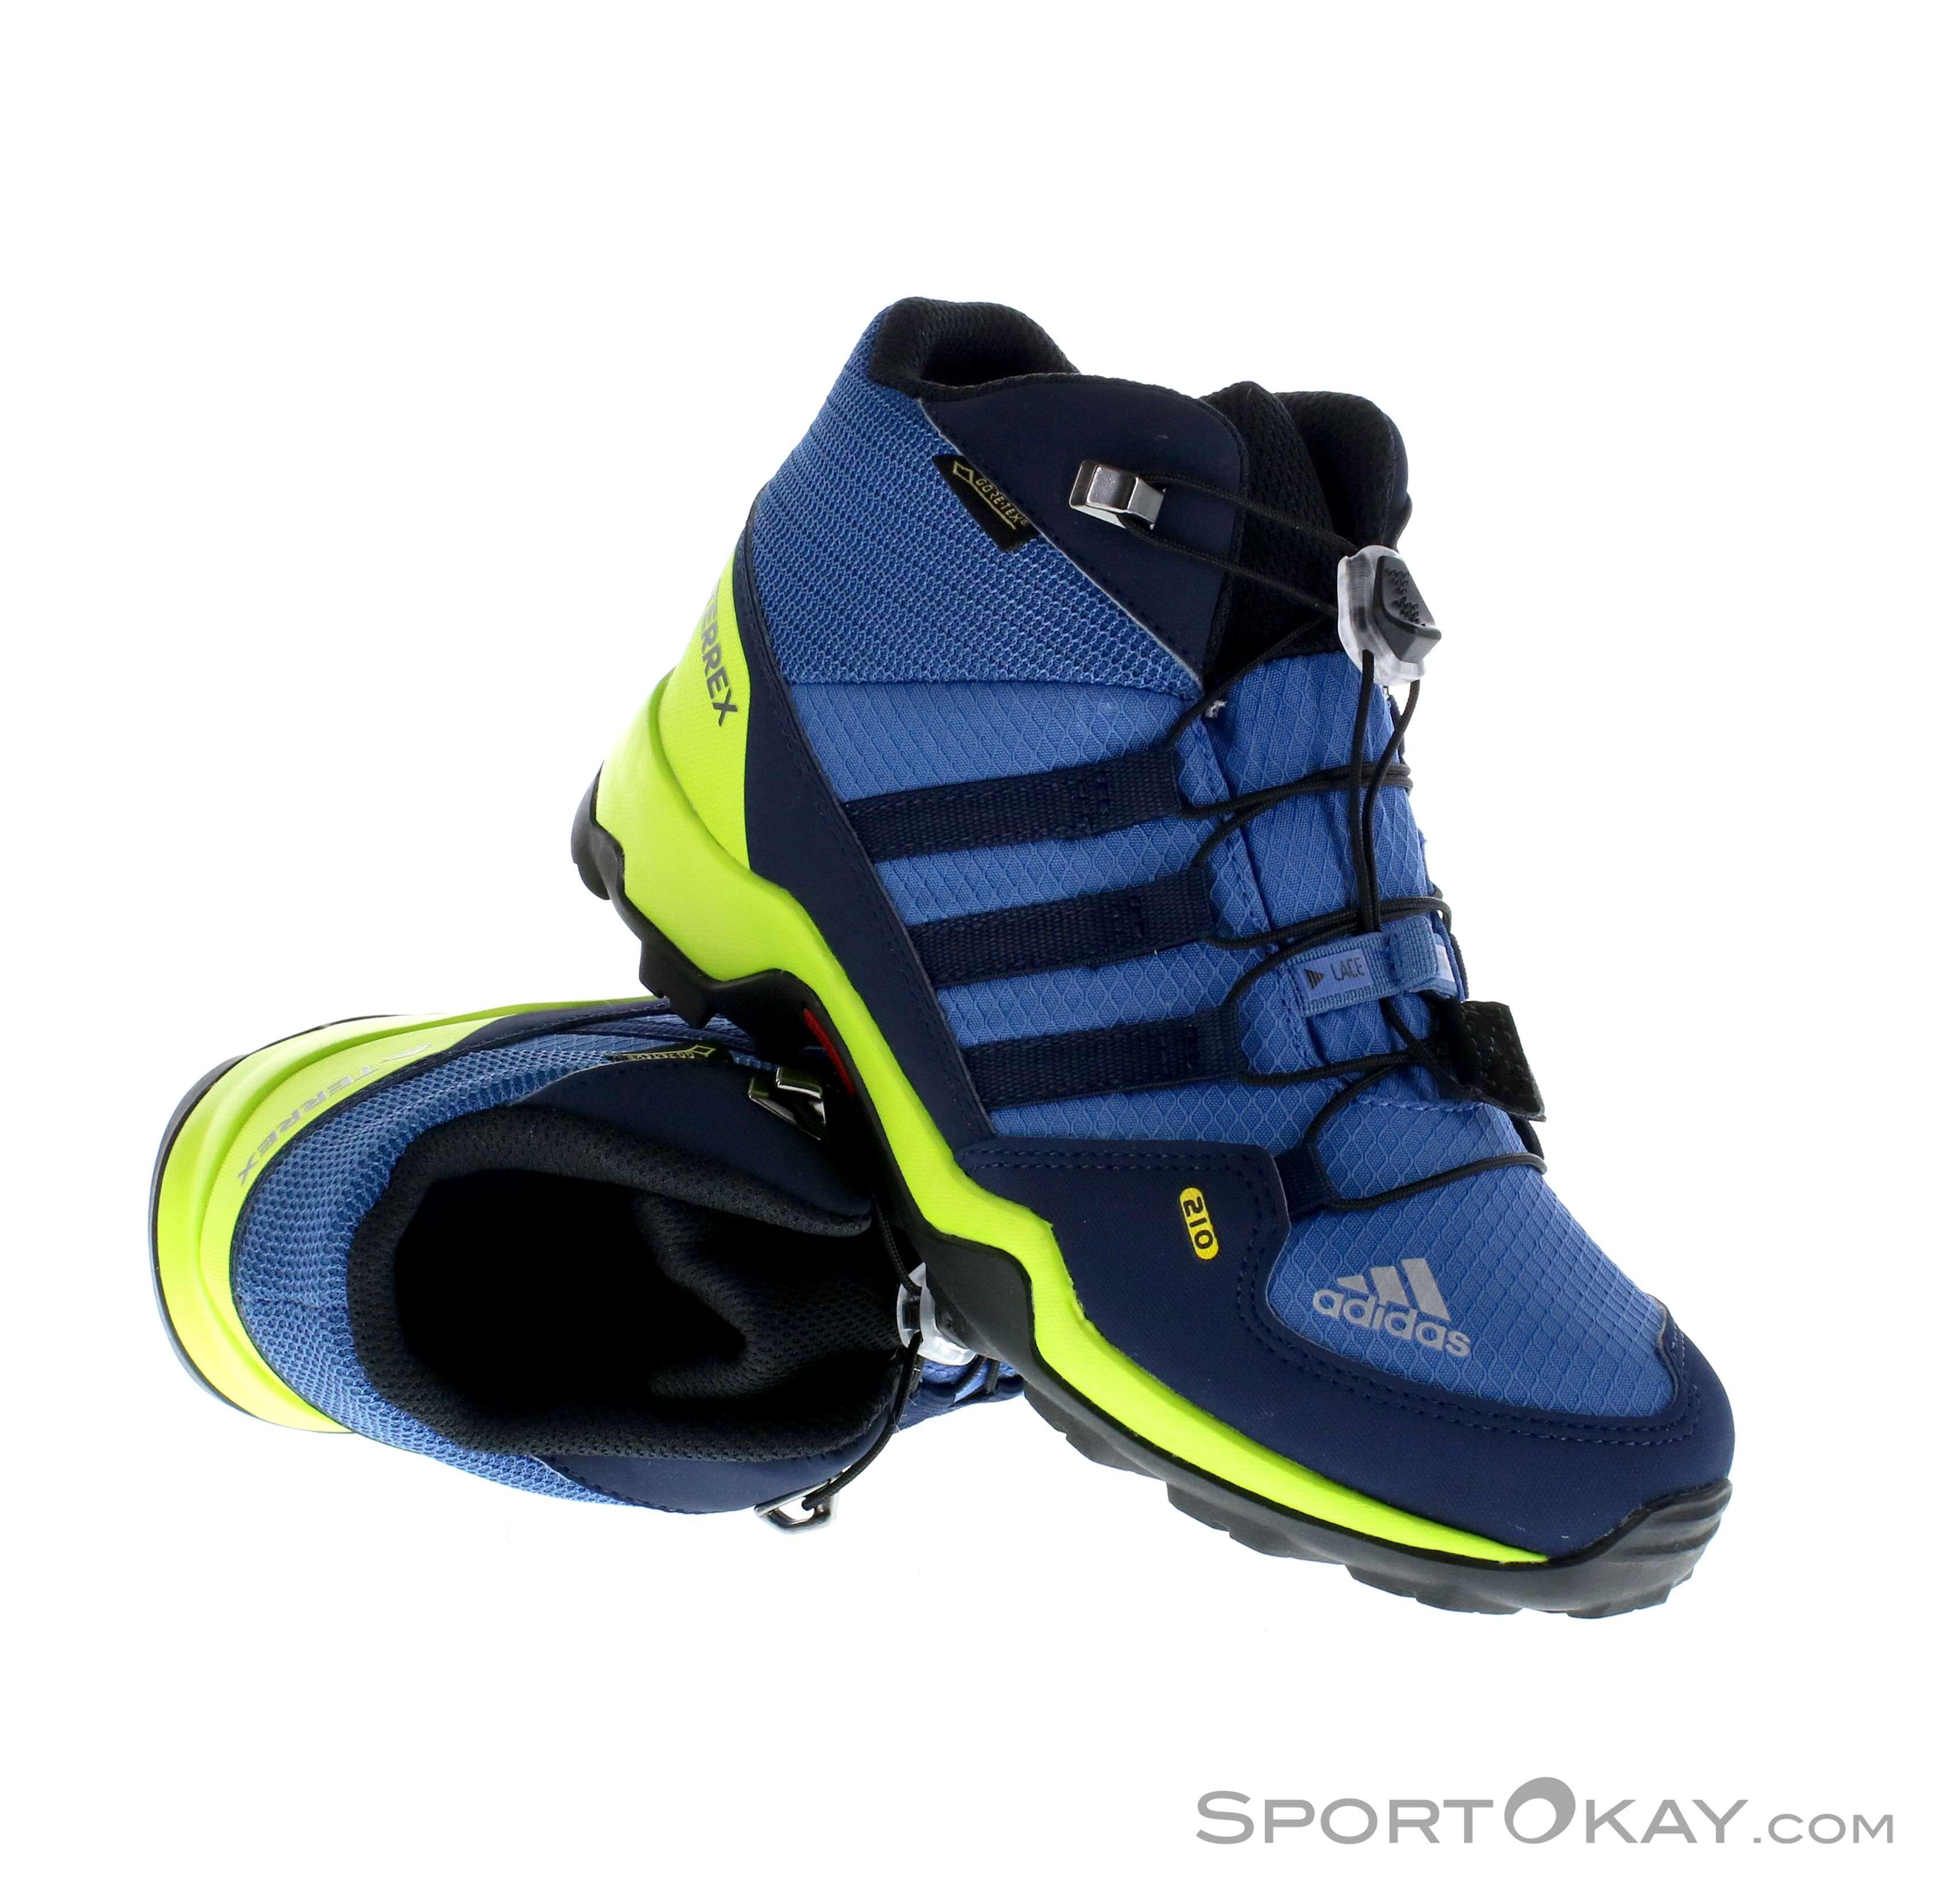 c449f5308ca45 adidas Terrex Mid GTX Kids Hiking Boots Gore-Tex - Trekking Shoes ...